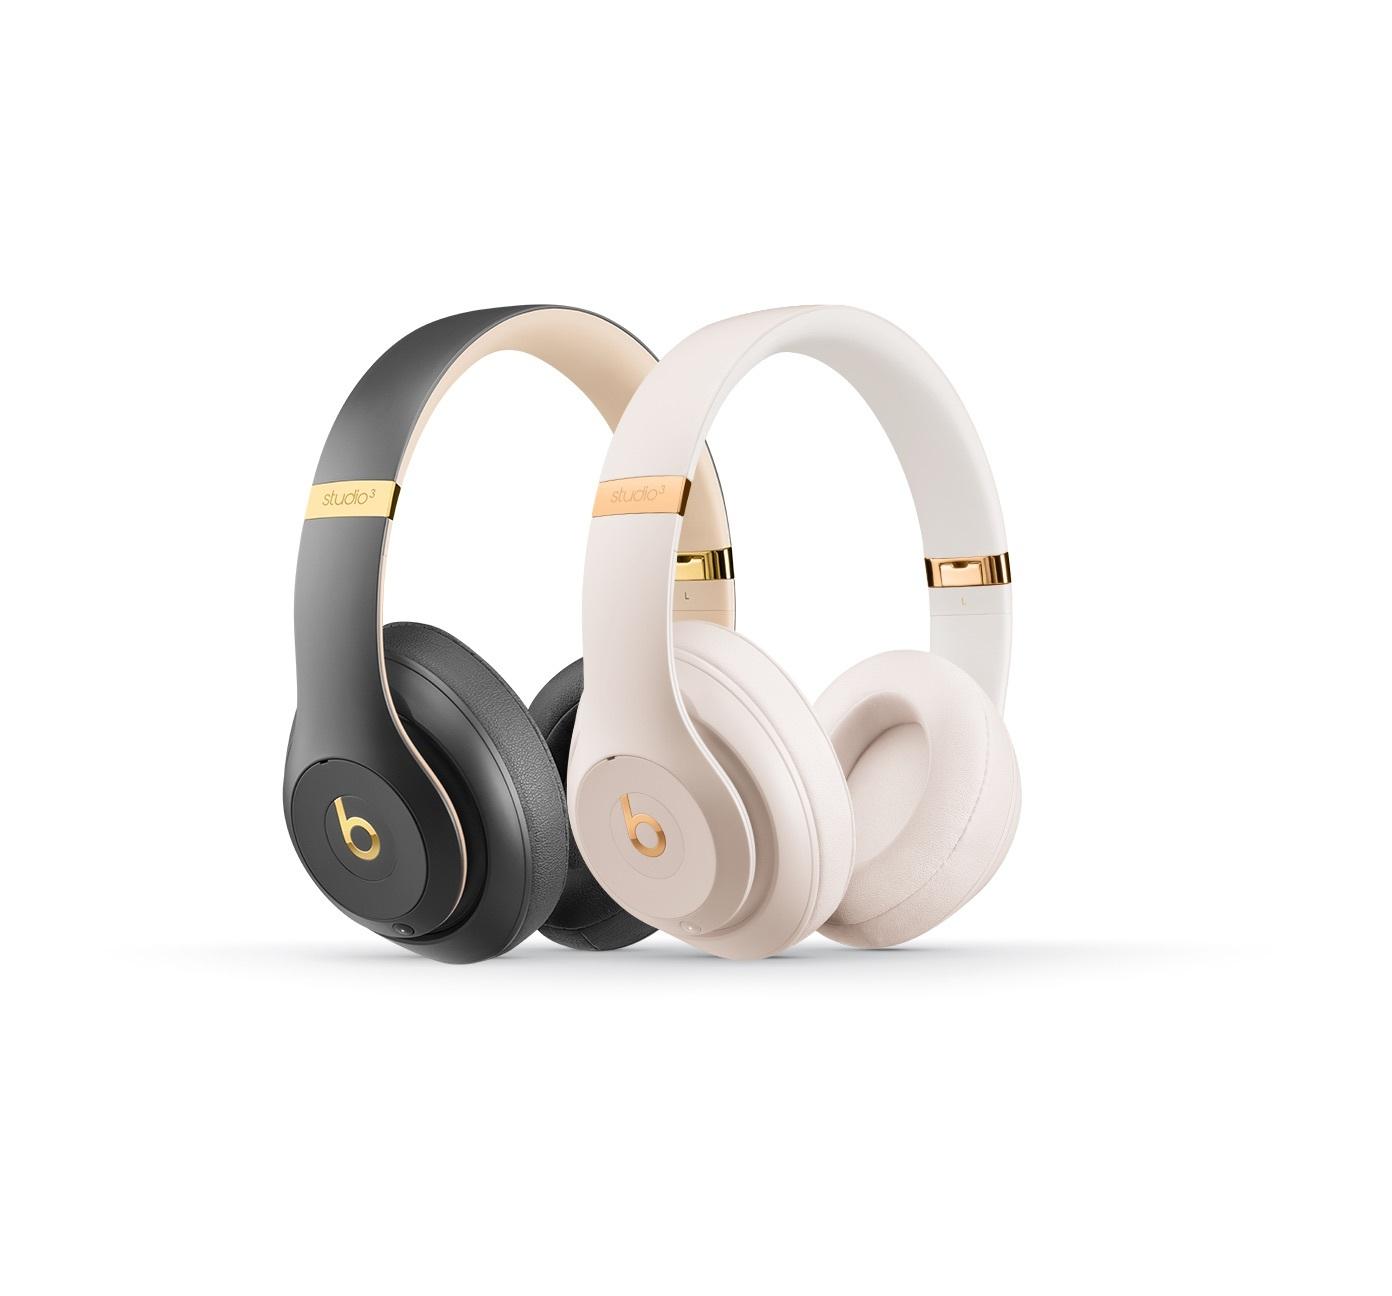 e4893ff4d8e Beats by Dr. Dre Launches Its Most Advanced Headphone